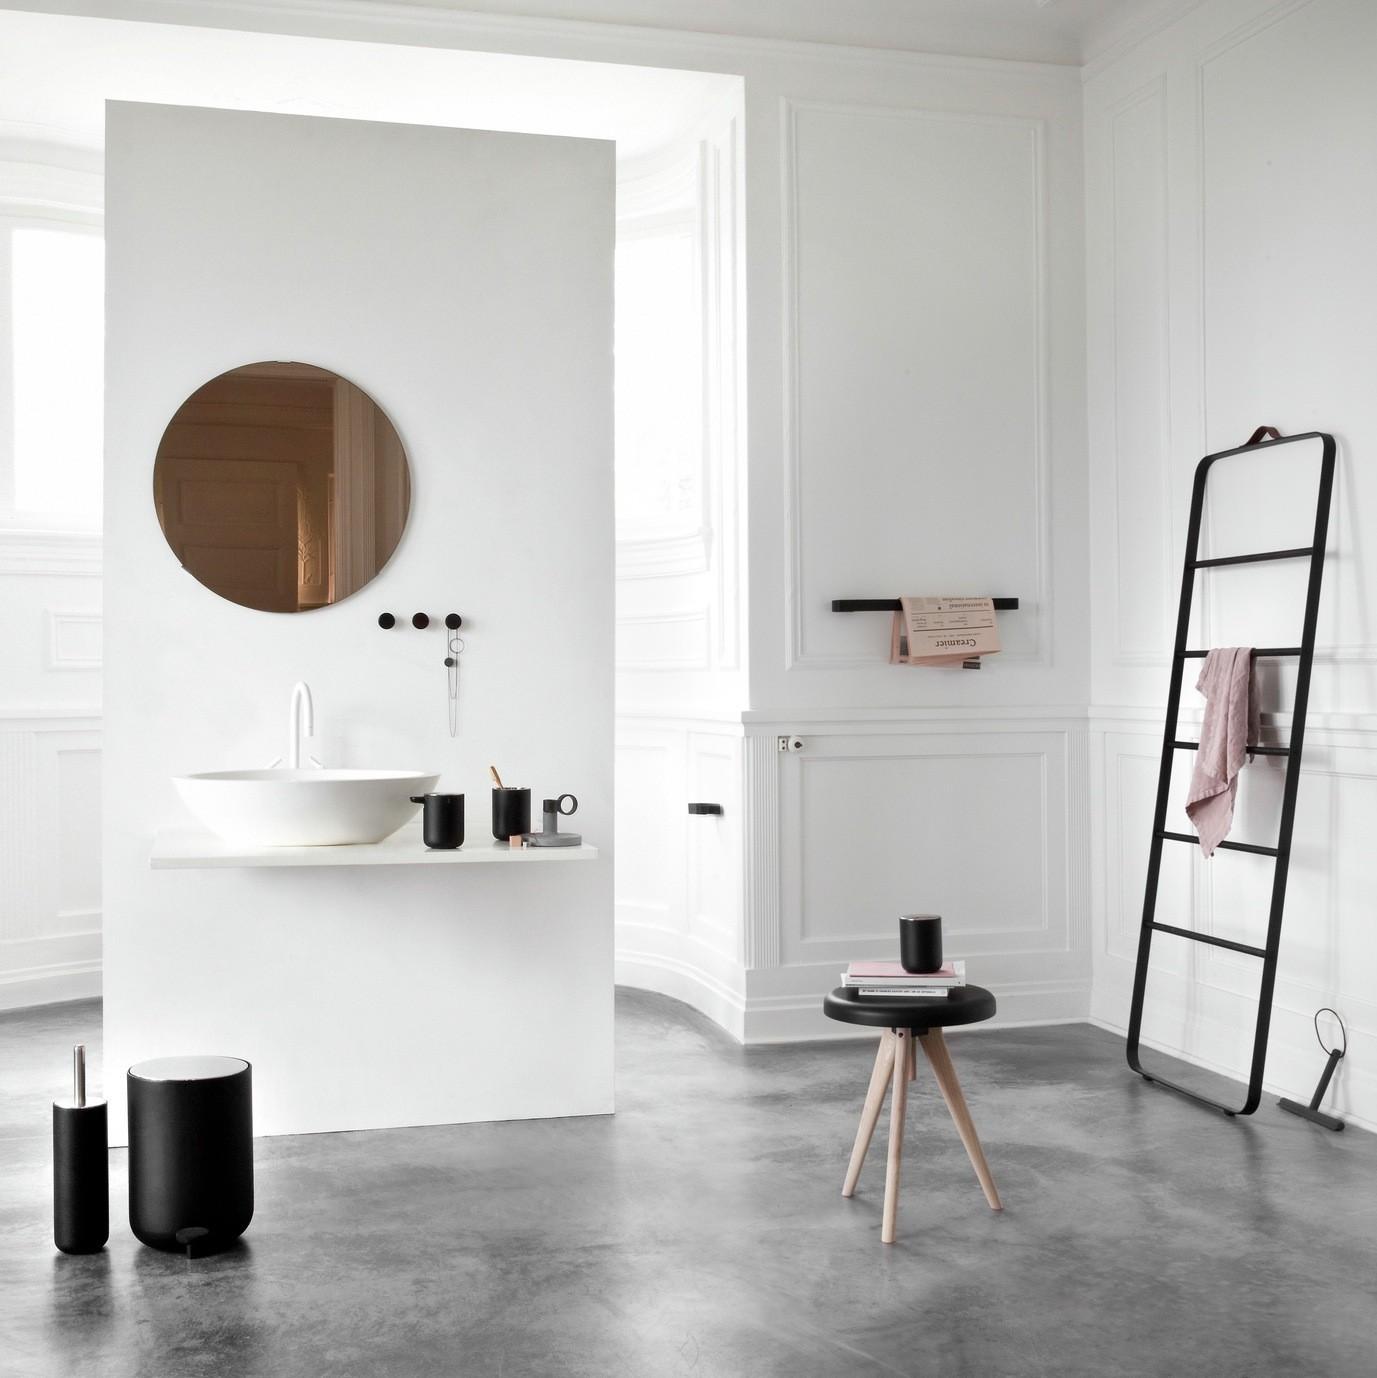 Menu towel ladder from Designstuff